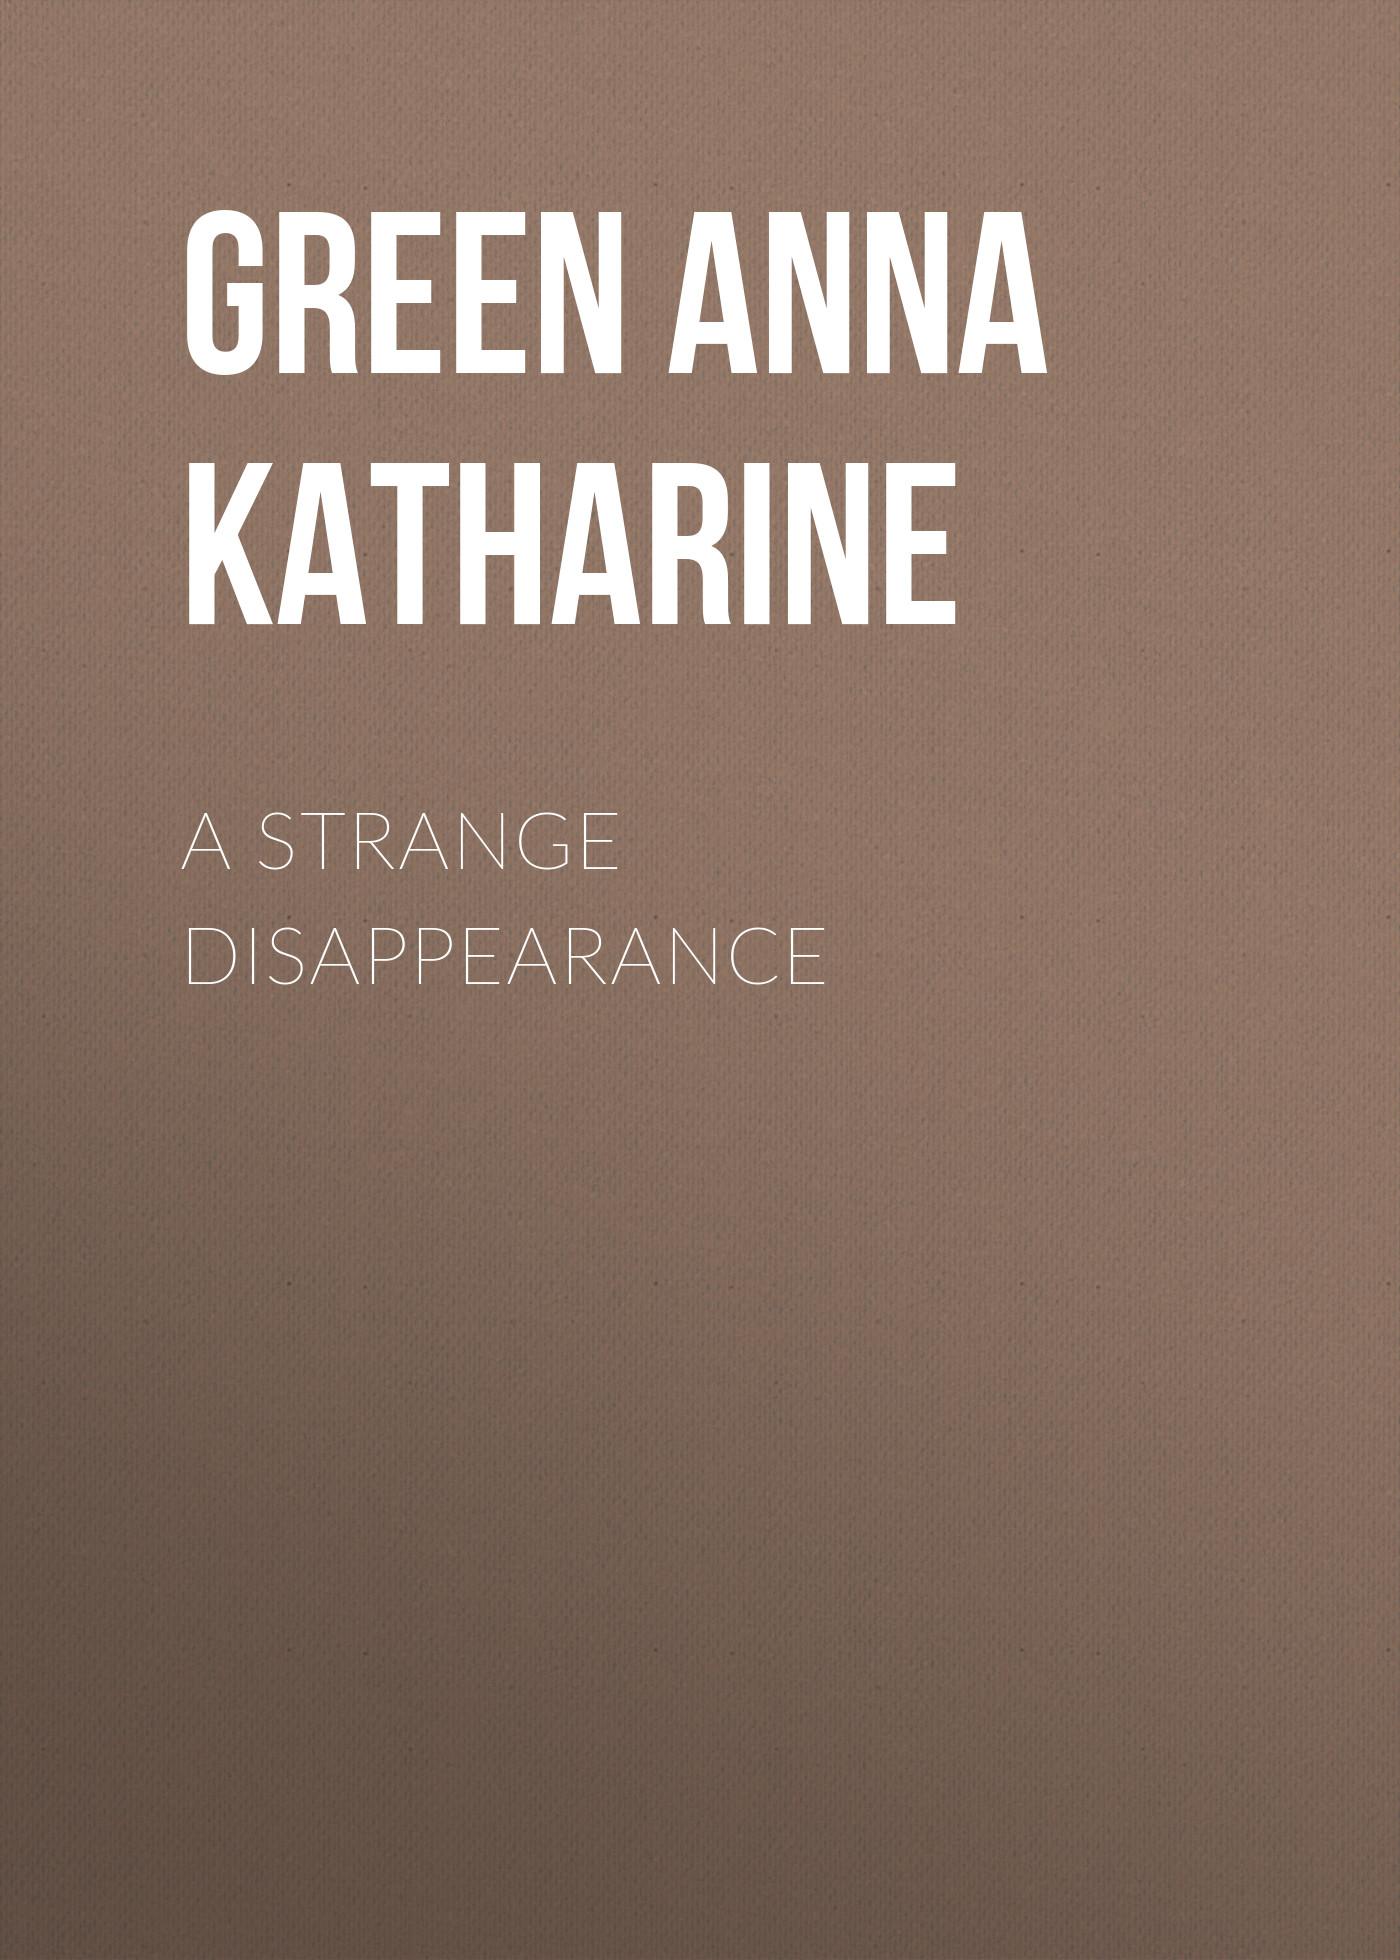 Green Anna Katharine A Strange Disappearance